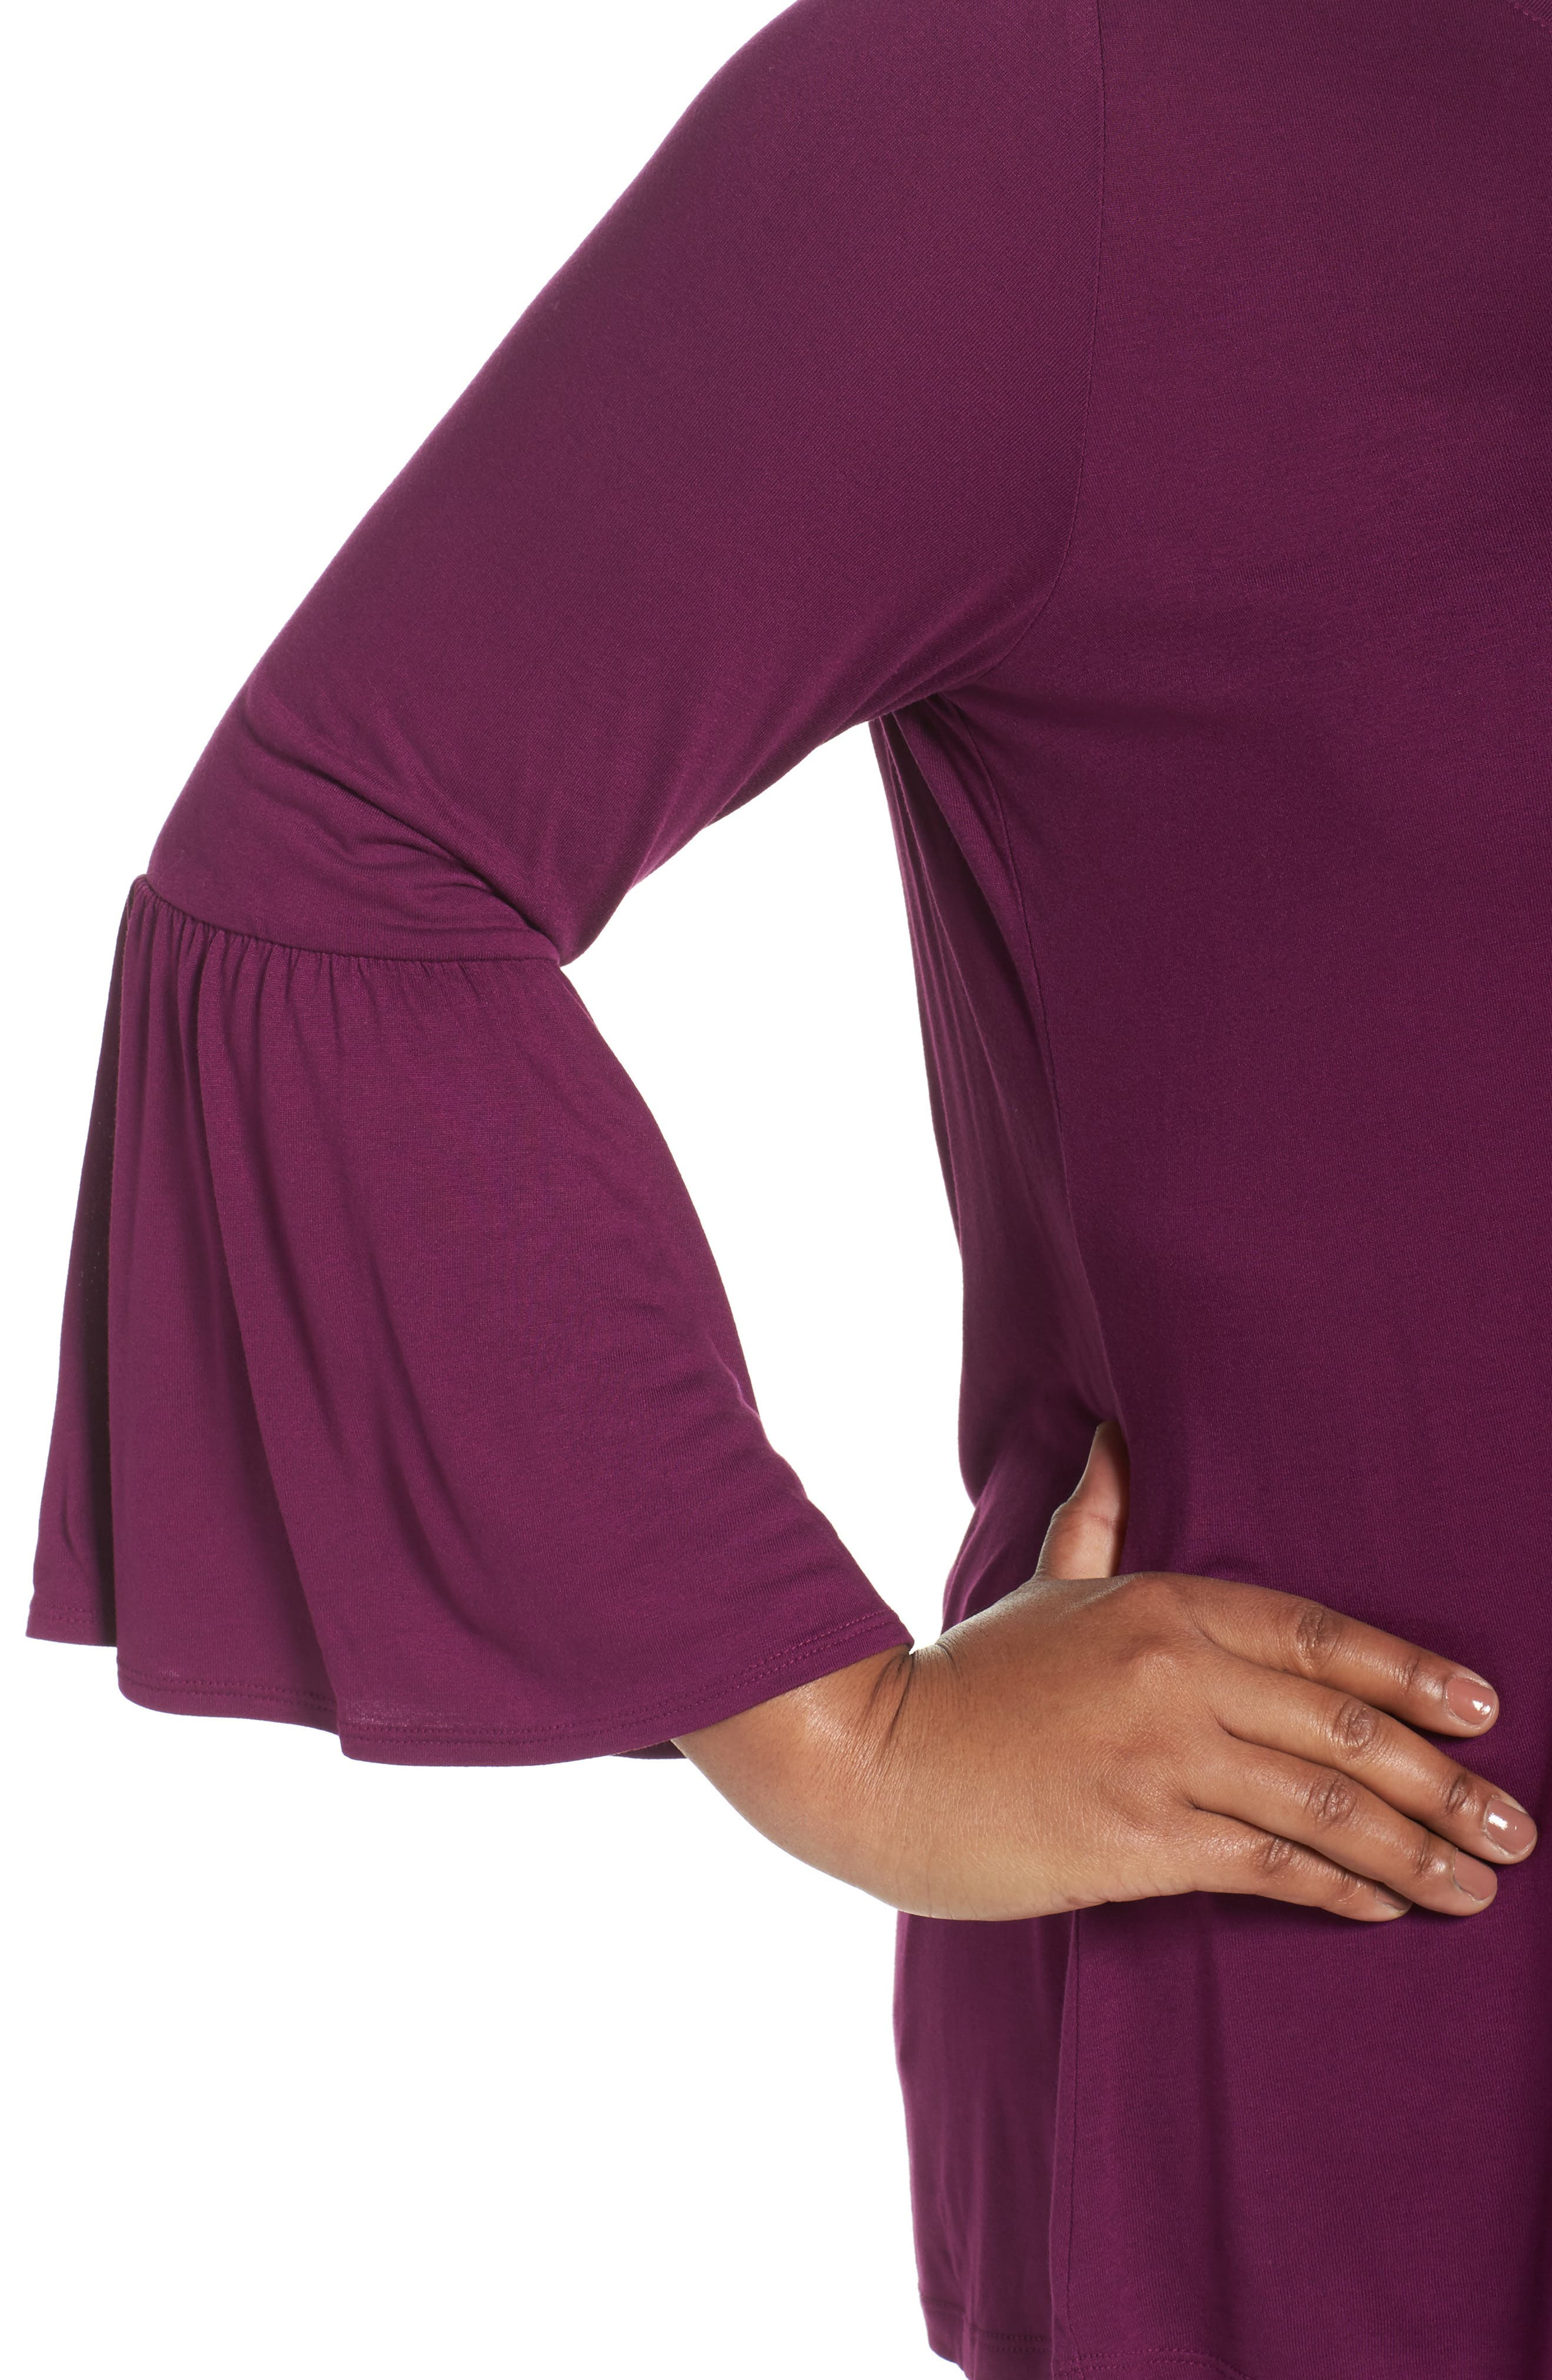 Bell Sleeve Tee,                             Alternate thumbnail 4, color,                             Purple Dark